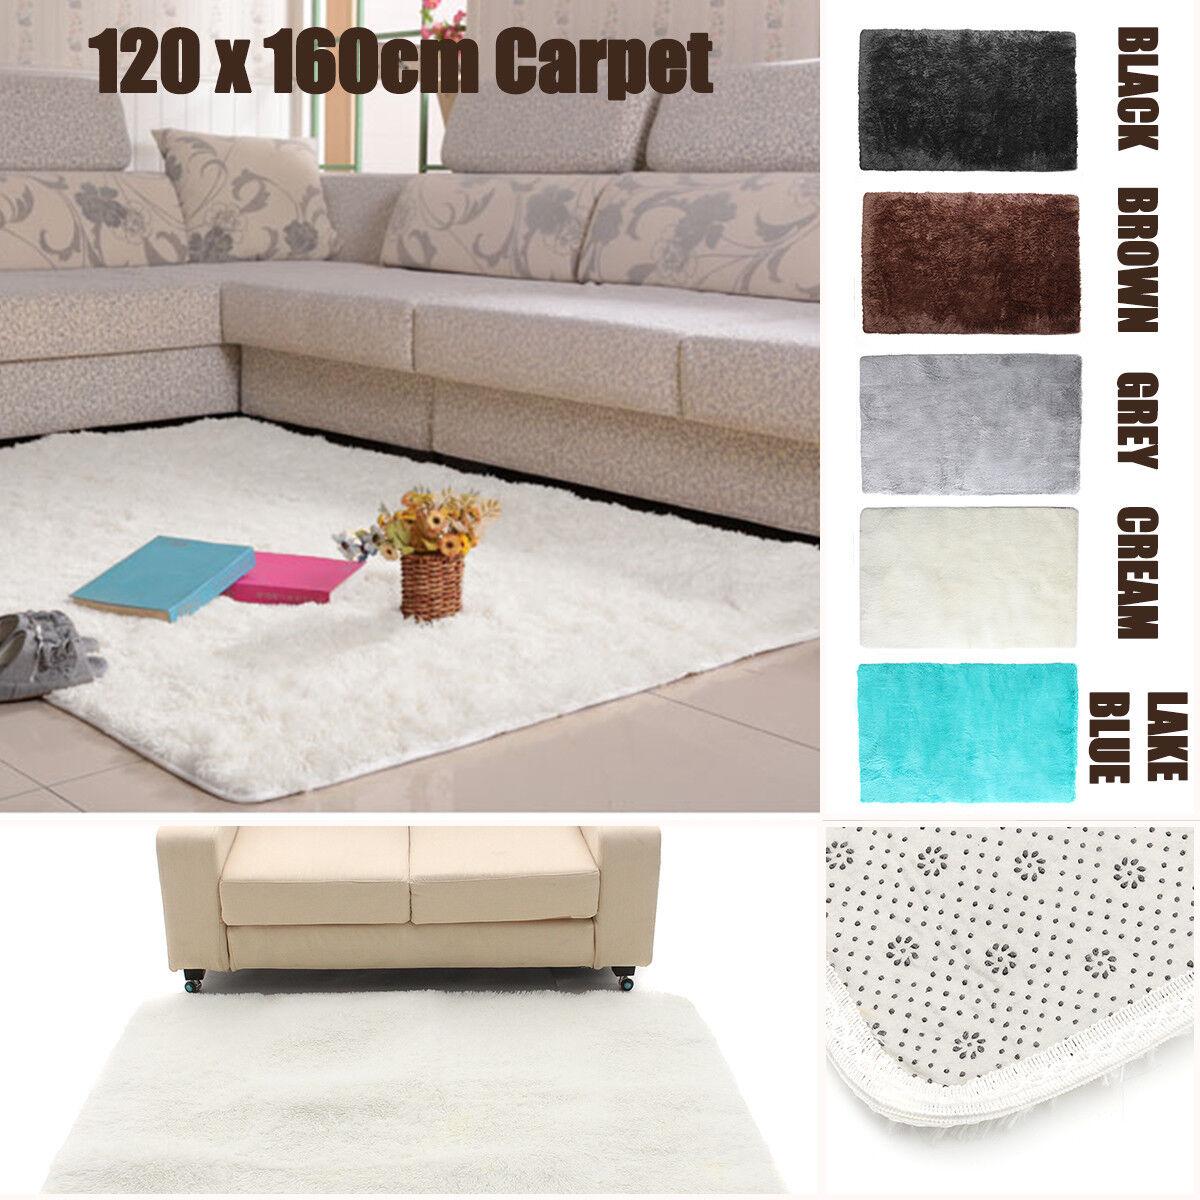 Living Room  3x5 Rugs - $_10_Must see Living Room  3x5 Rugs - $_10  You Should Have_17409.JPG?set_id\u003d8800005007